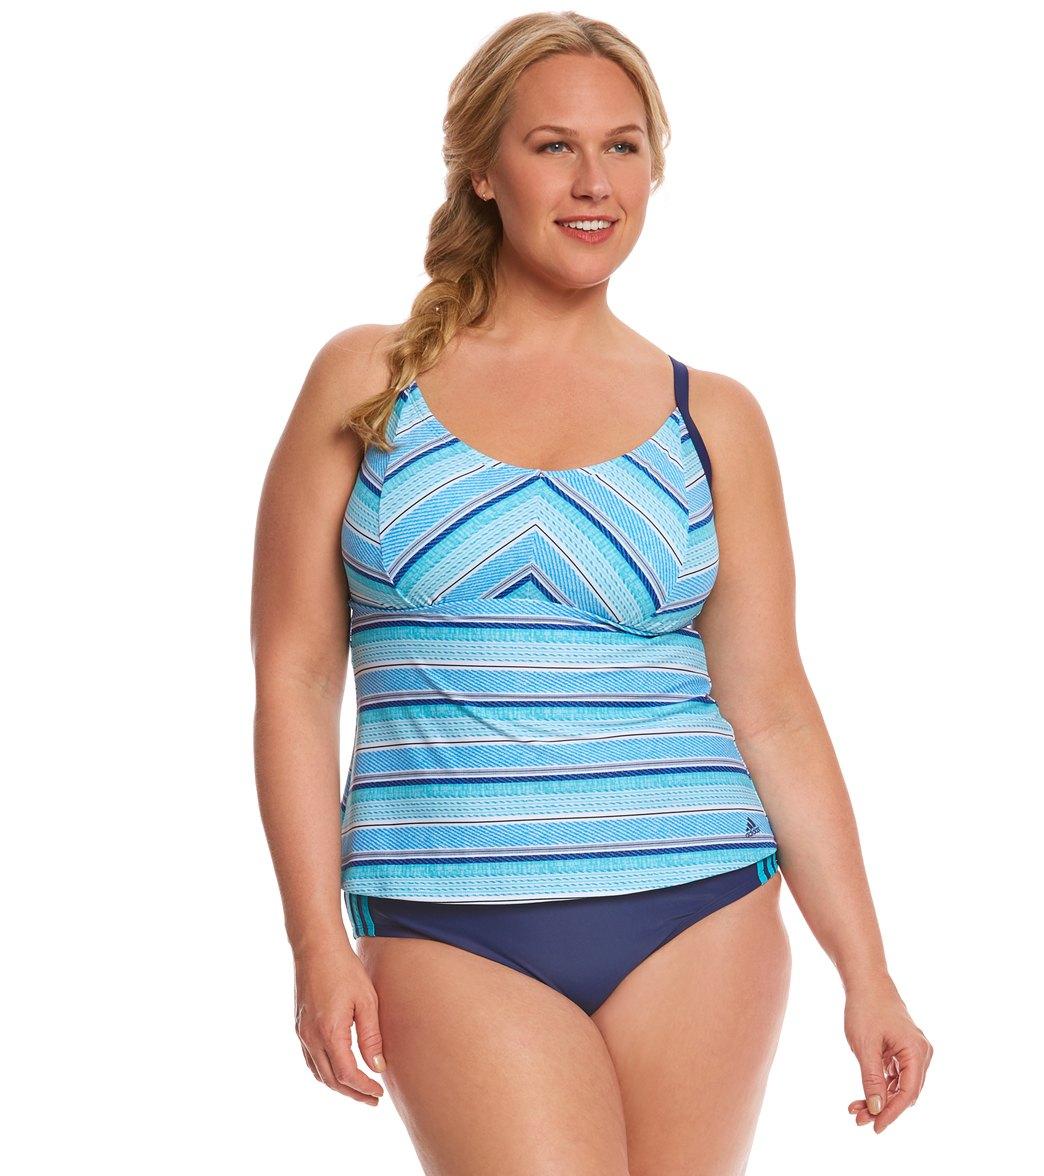 c4b8bc8c1ea65 Adidas Women's Stripe a Pose Tankini Top at SwimOutlet.com - Free ...